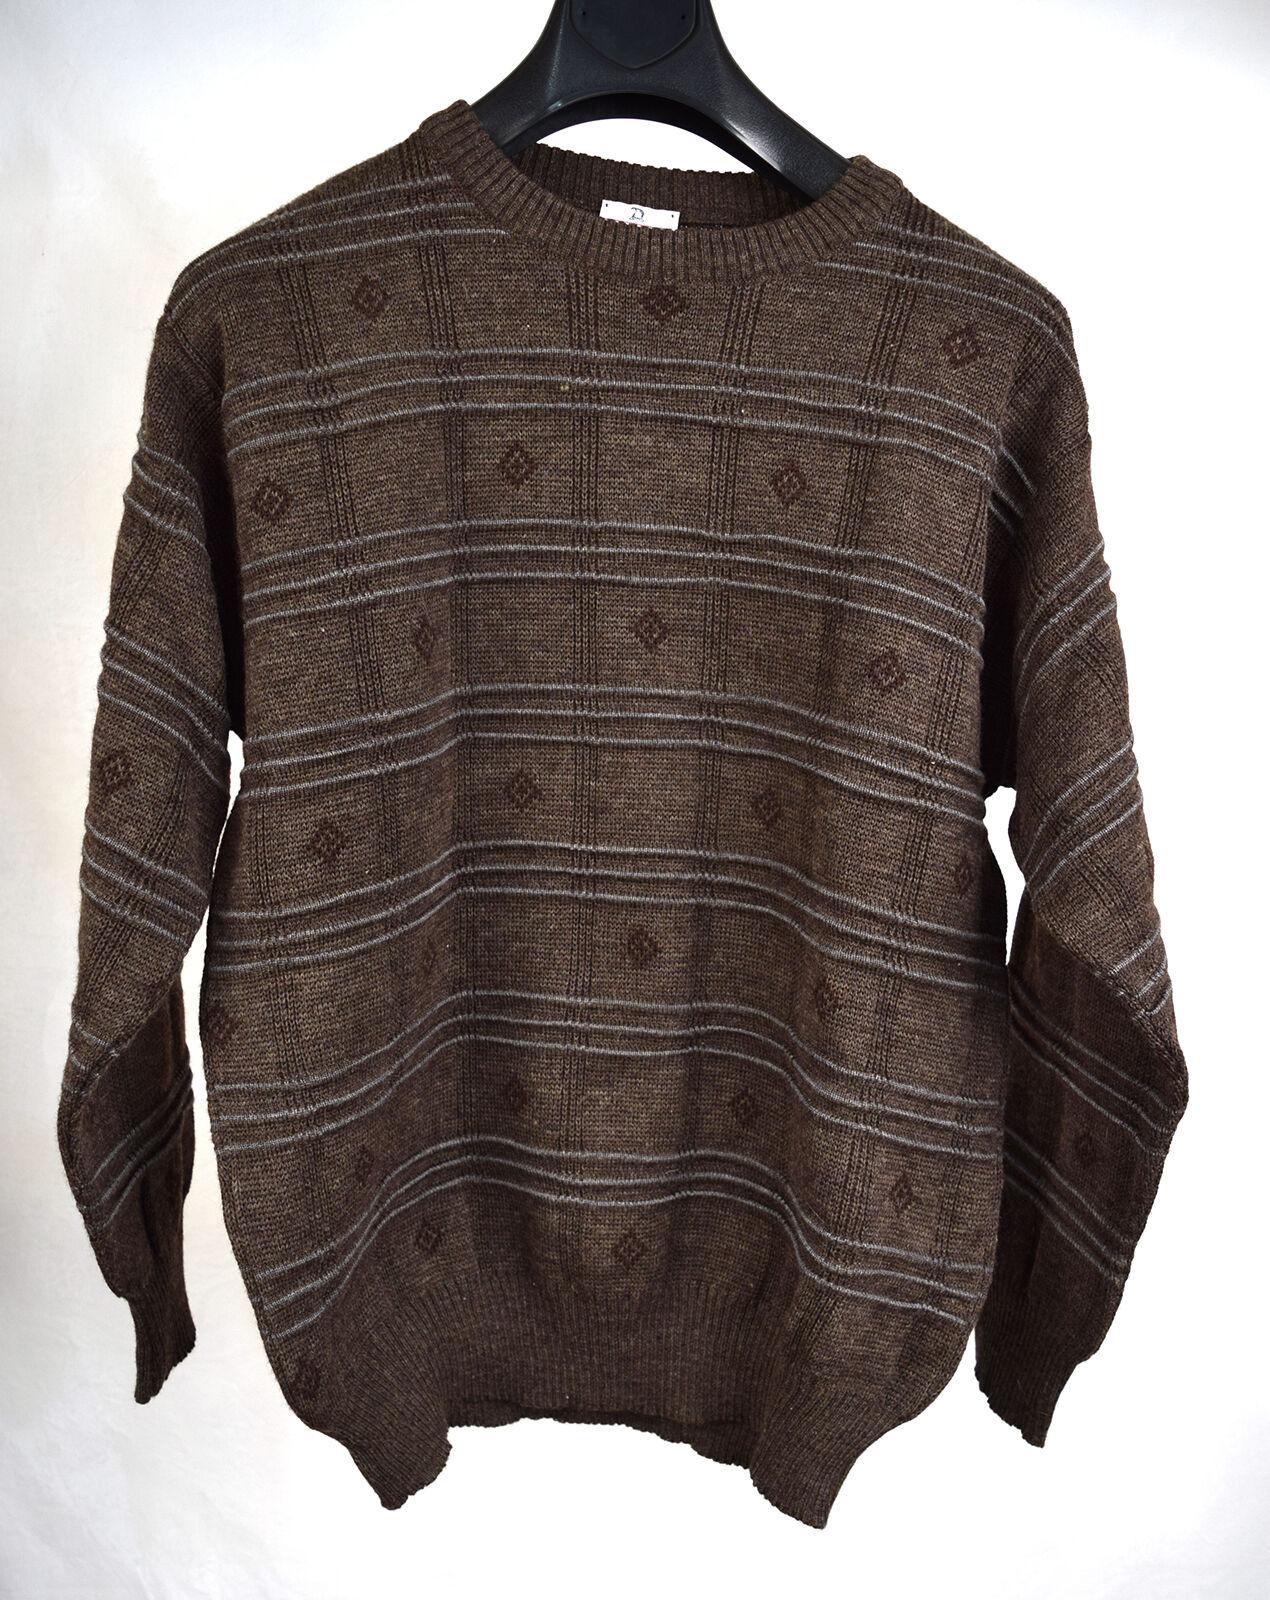 Neiman Marcus Sweater Brown 3D Knit Strip Geometric 100% Wool M Vintage